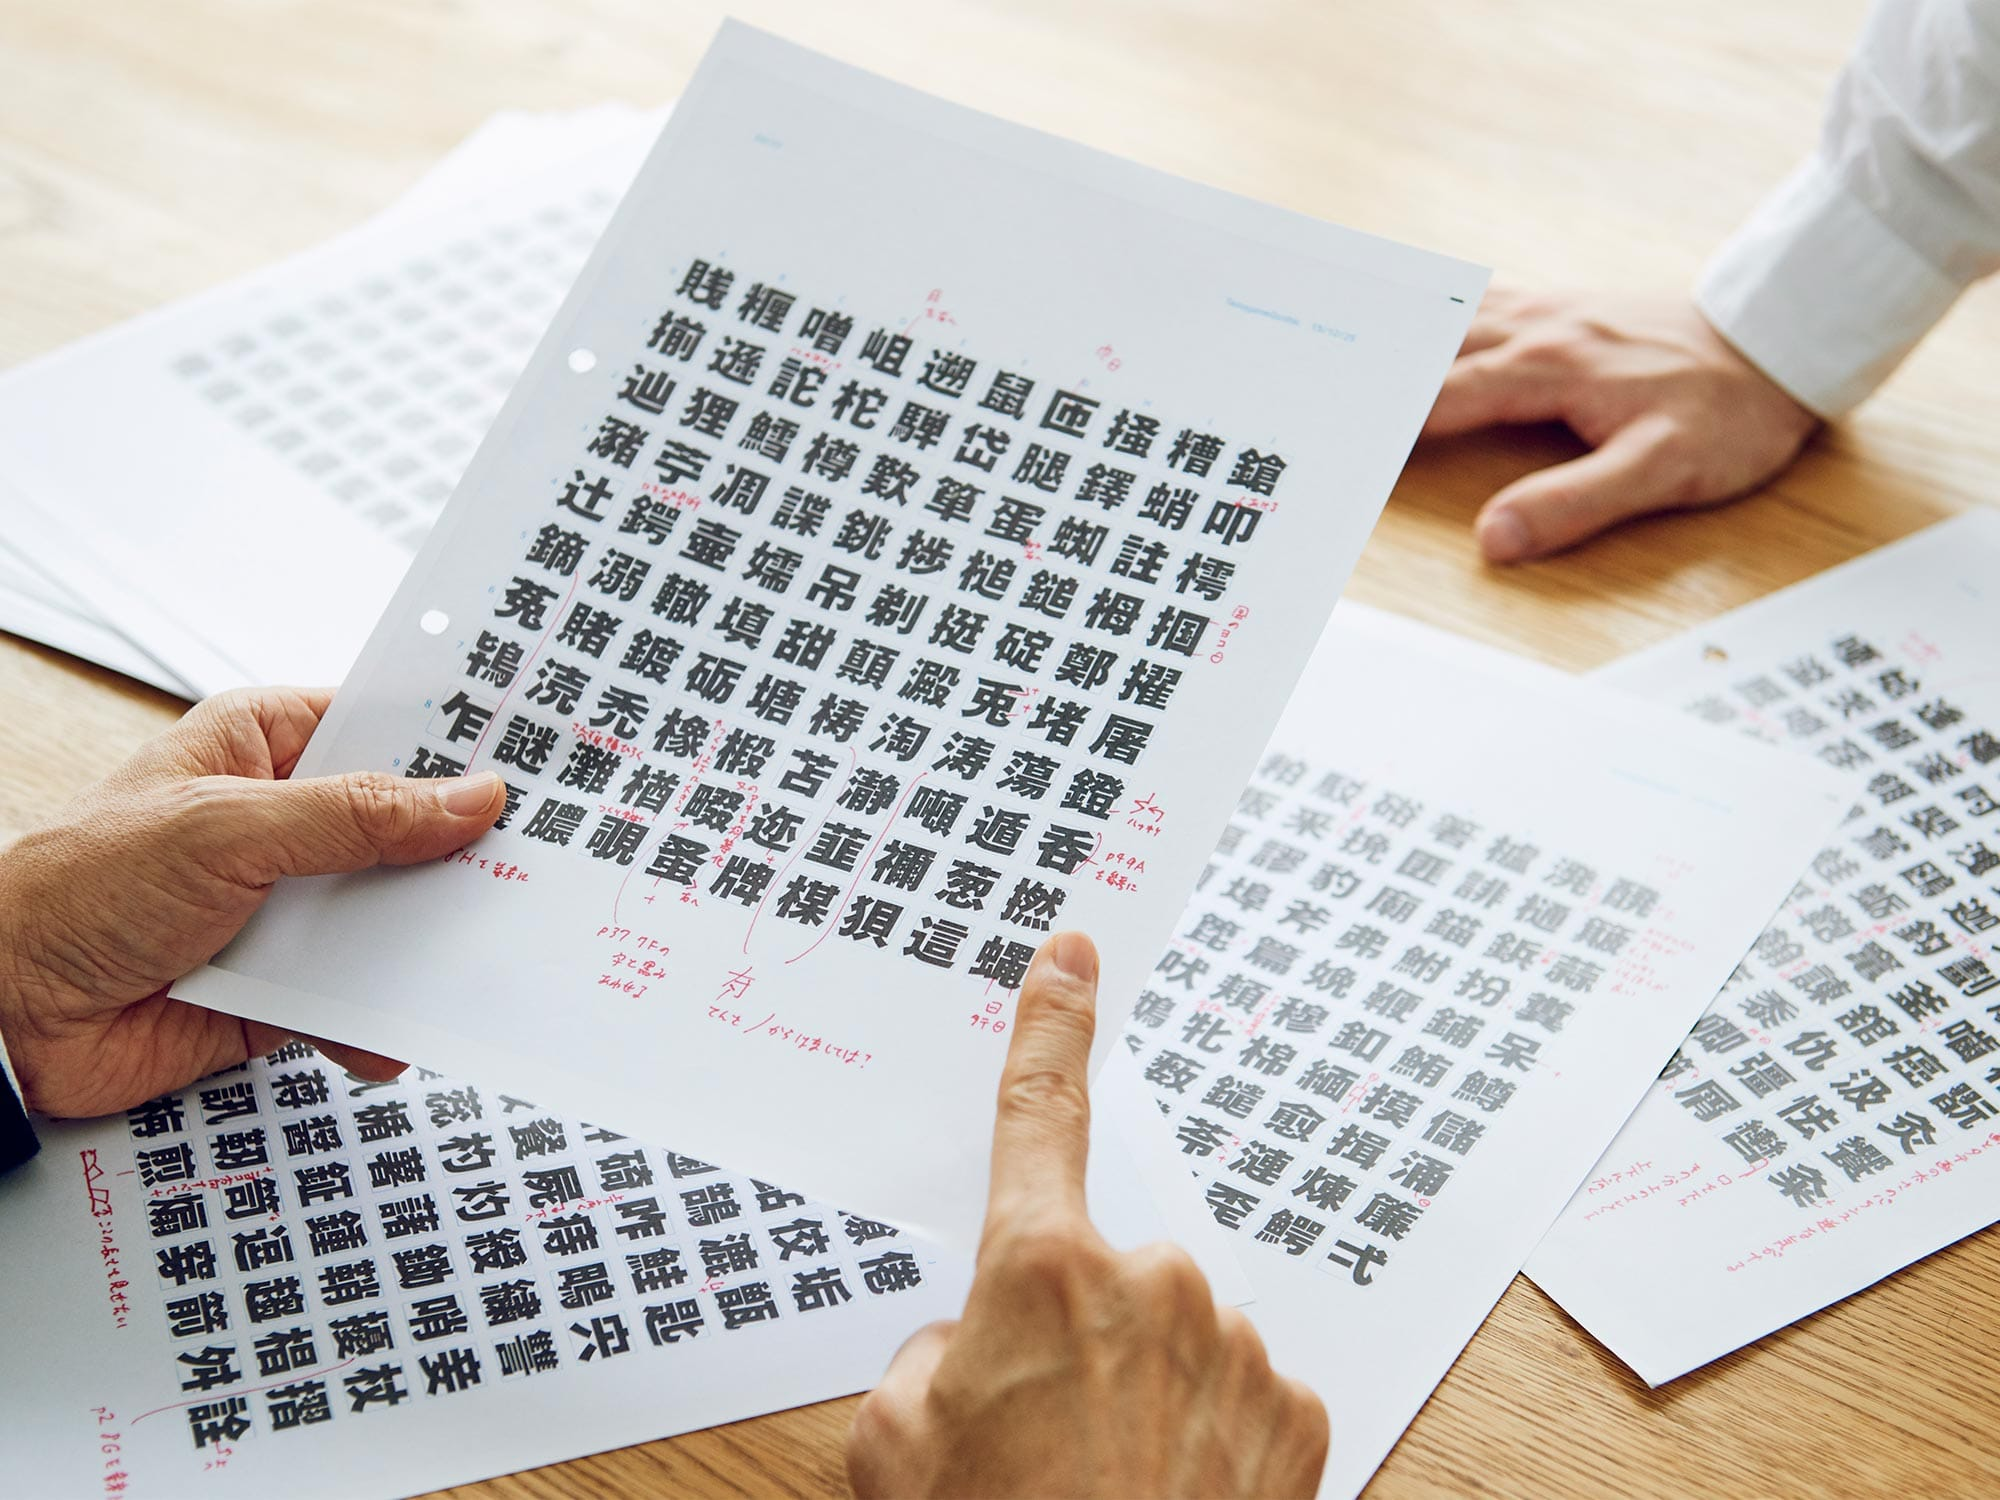 Development work for Monotypes new Tazugane typeface